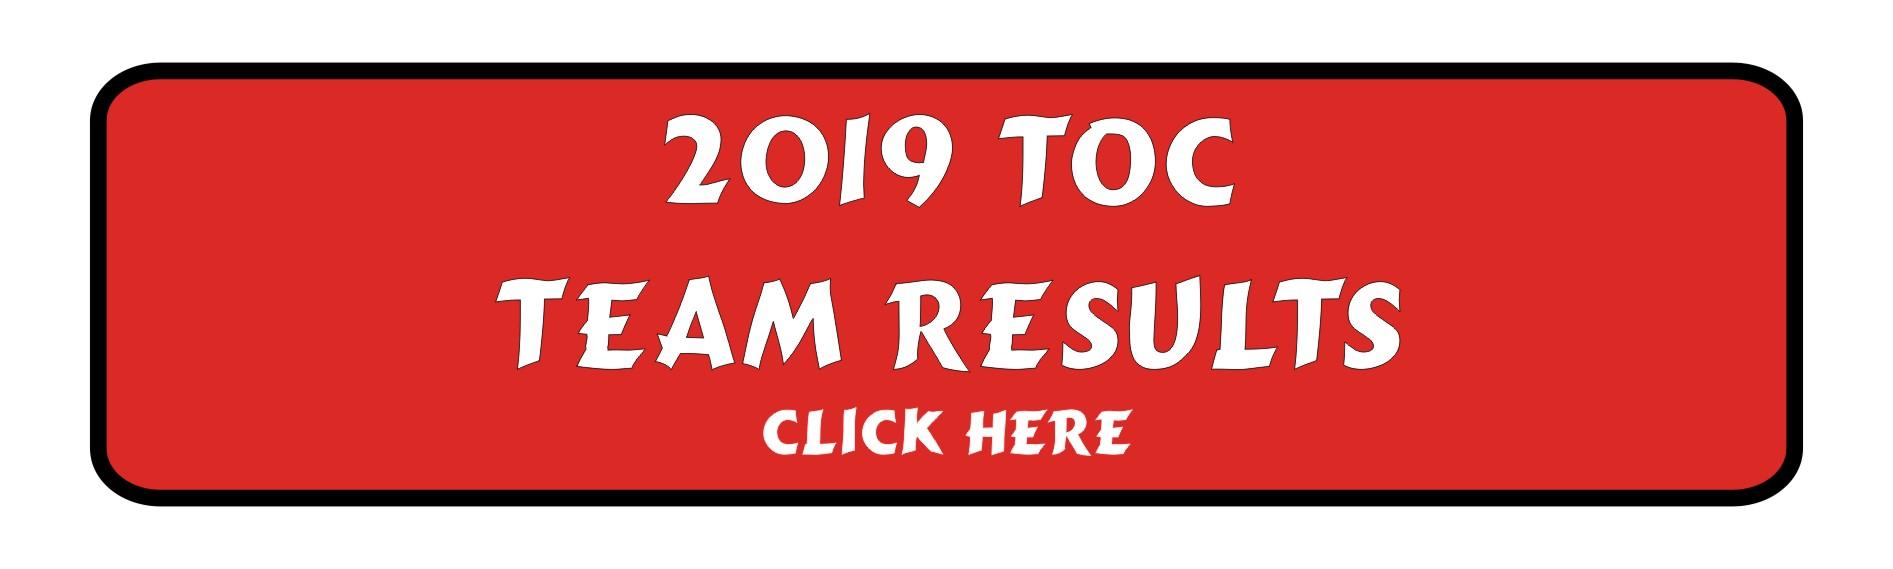 Team-TOC.jpg